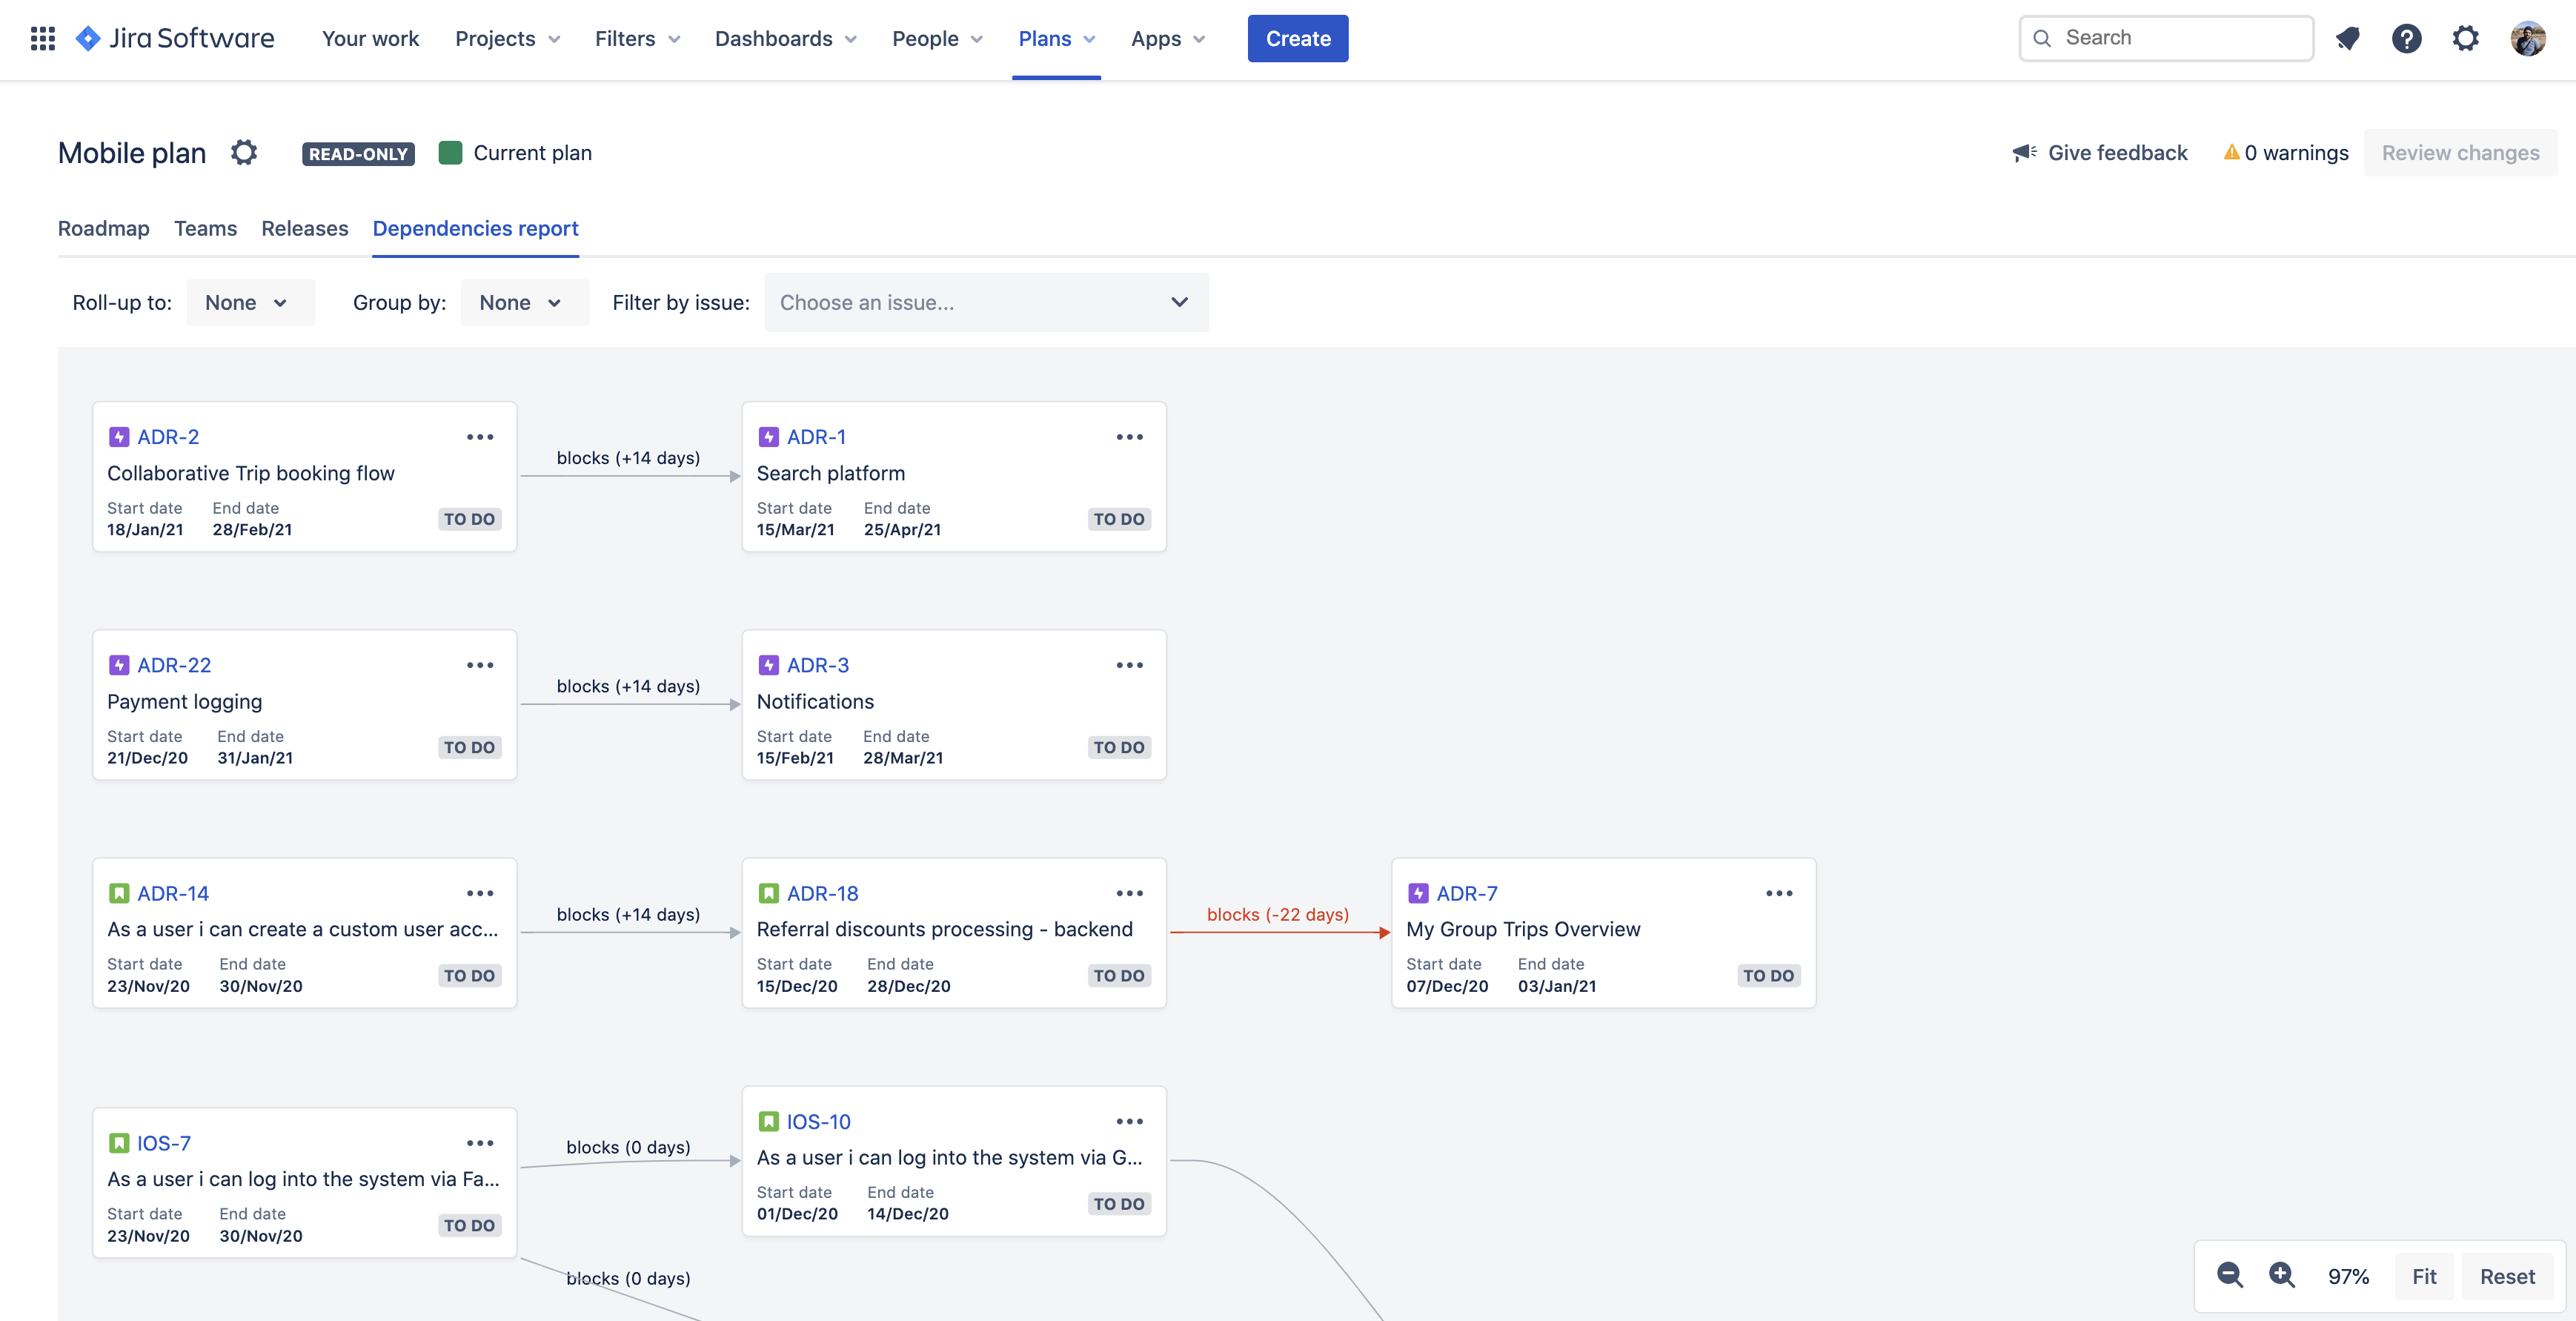 Advanced Roadmap dependencies report tab